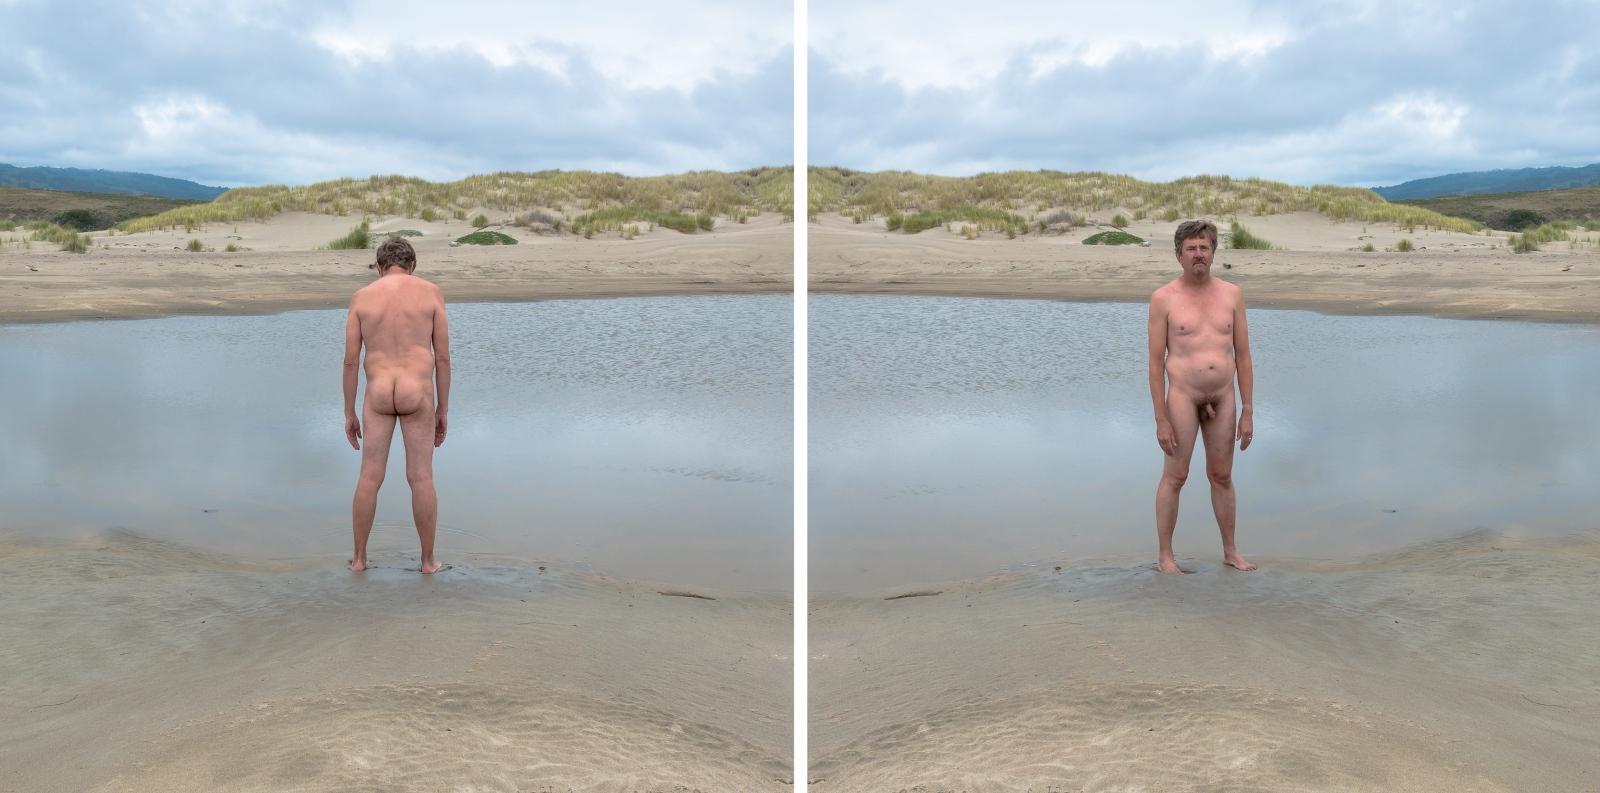 Art and Documentary Photography - Loading doubleneweditmay7-Edit.jpg